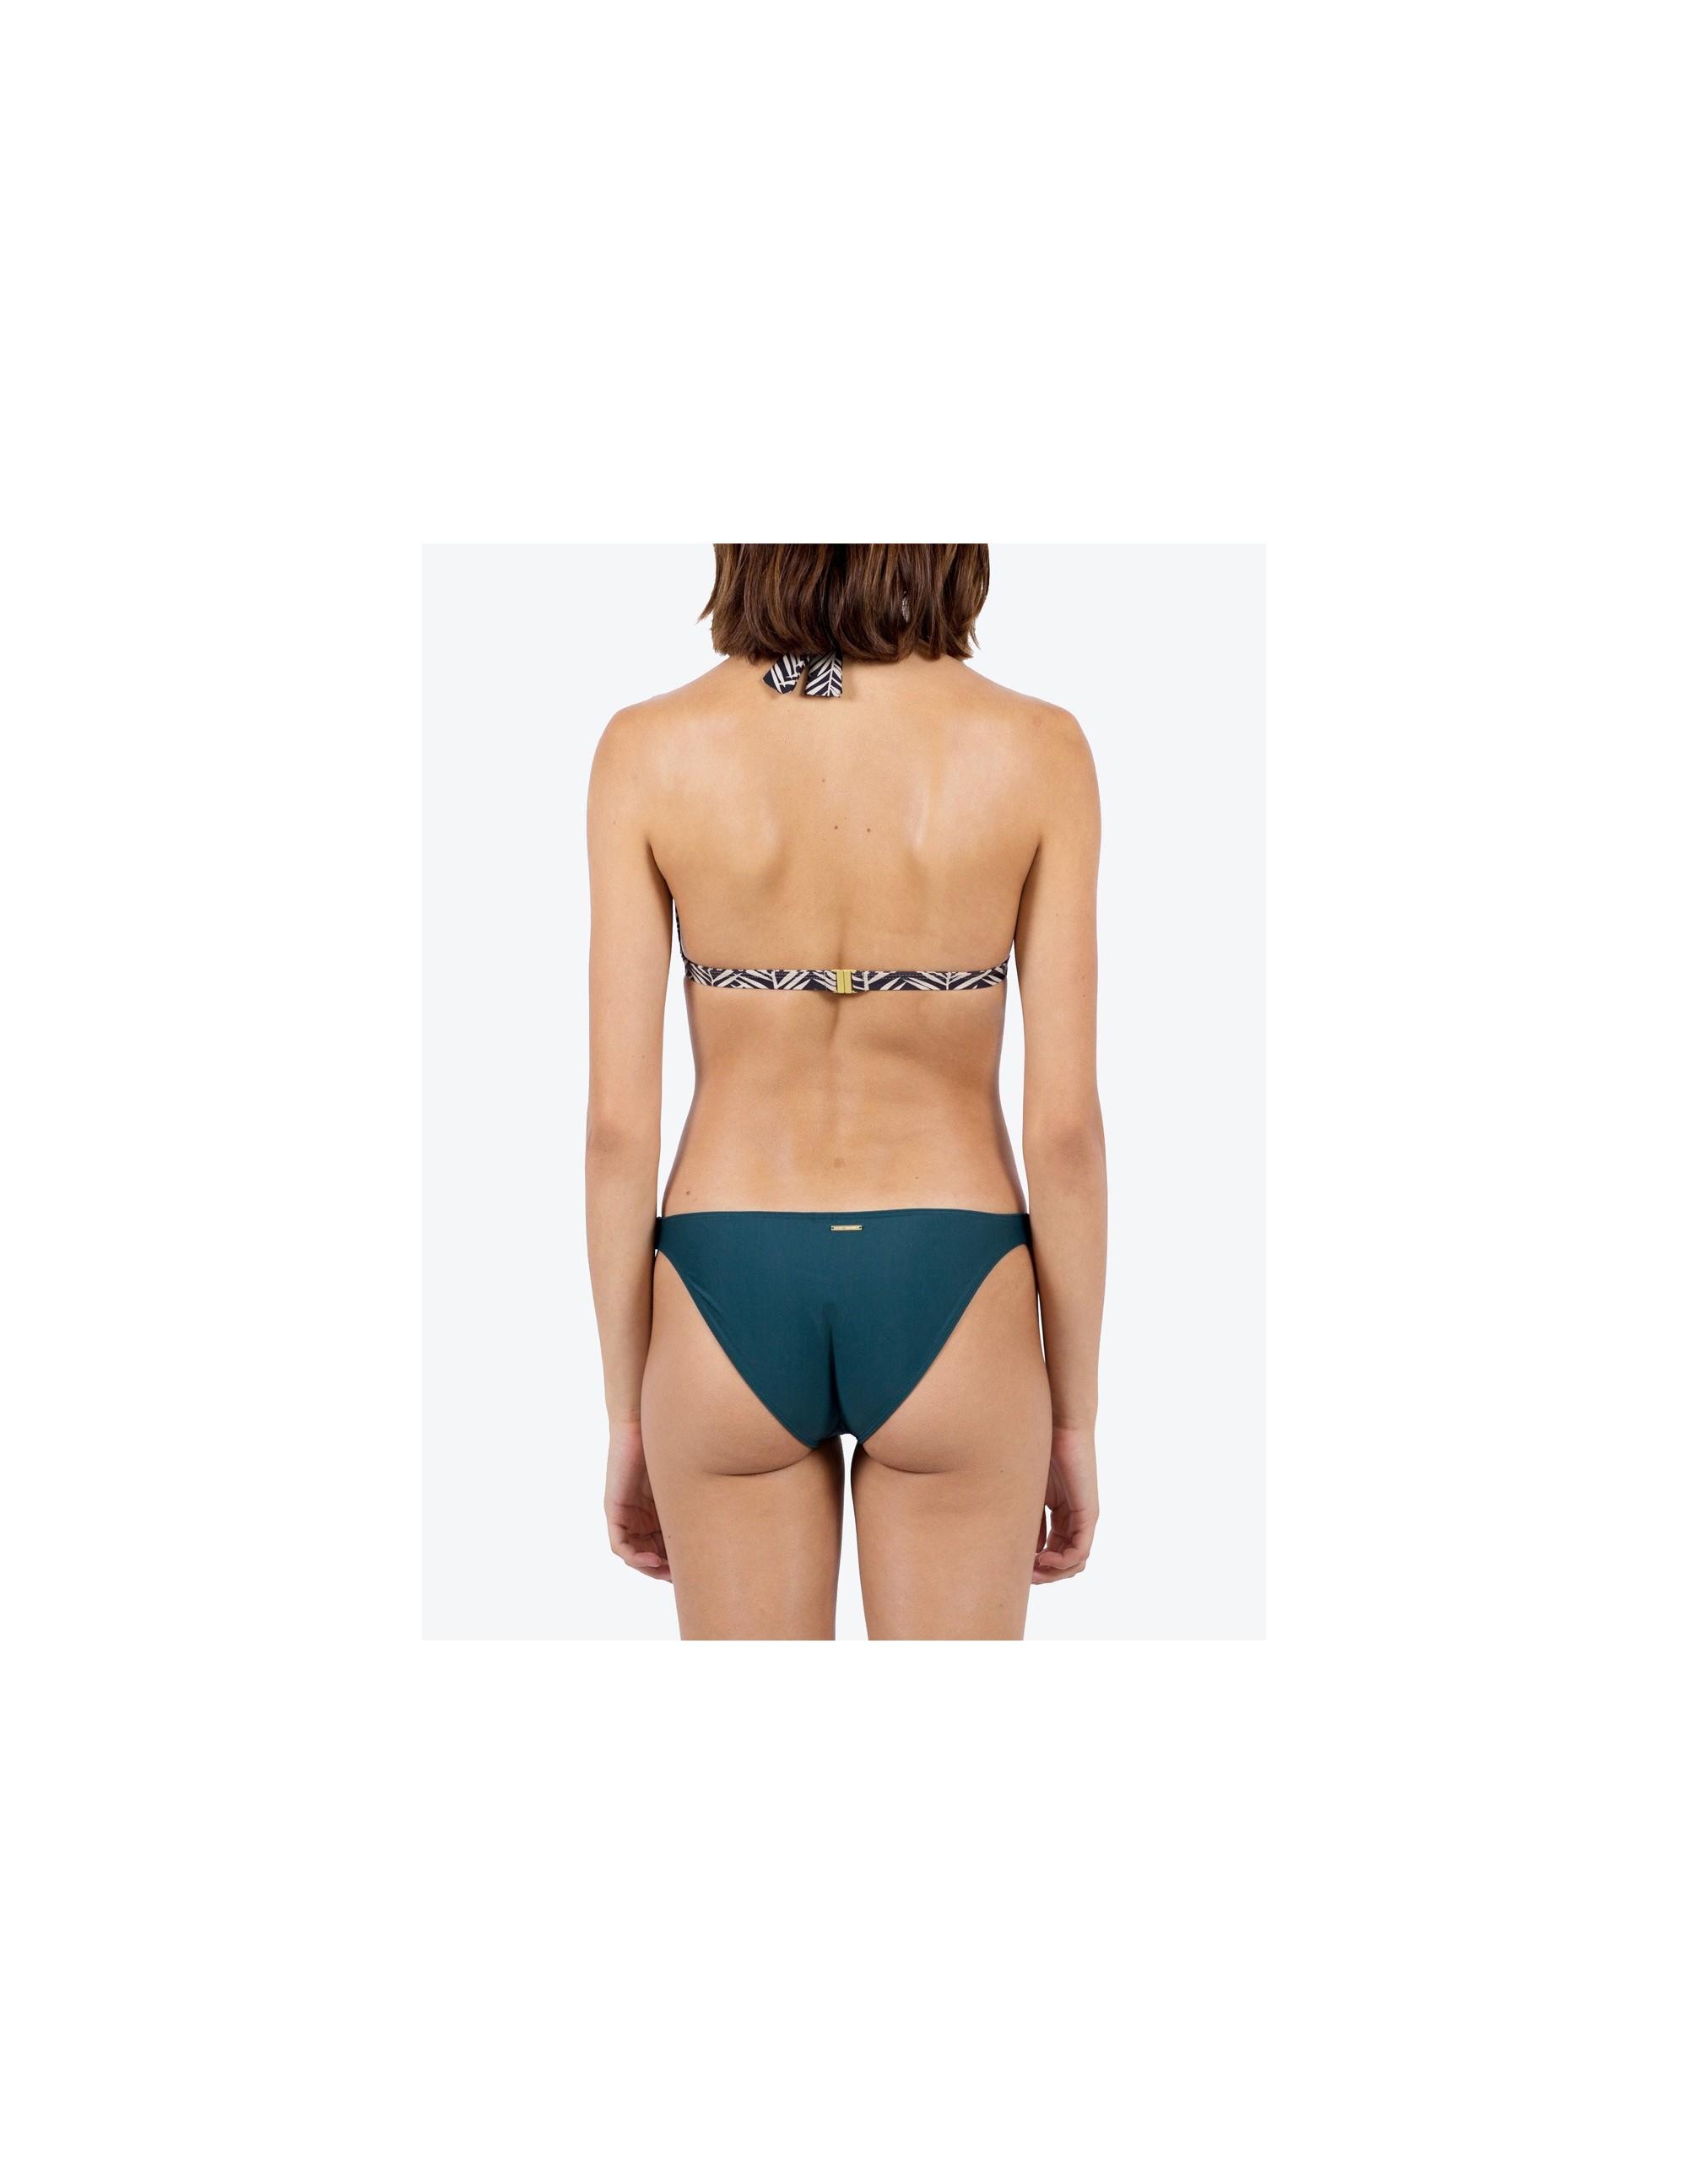 PARAISO bikini bottom - DEEP GREEN